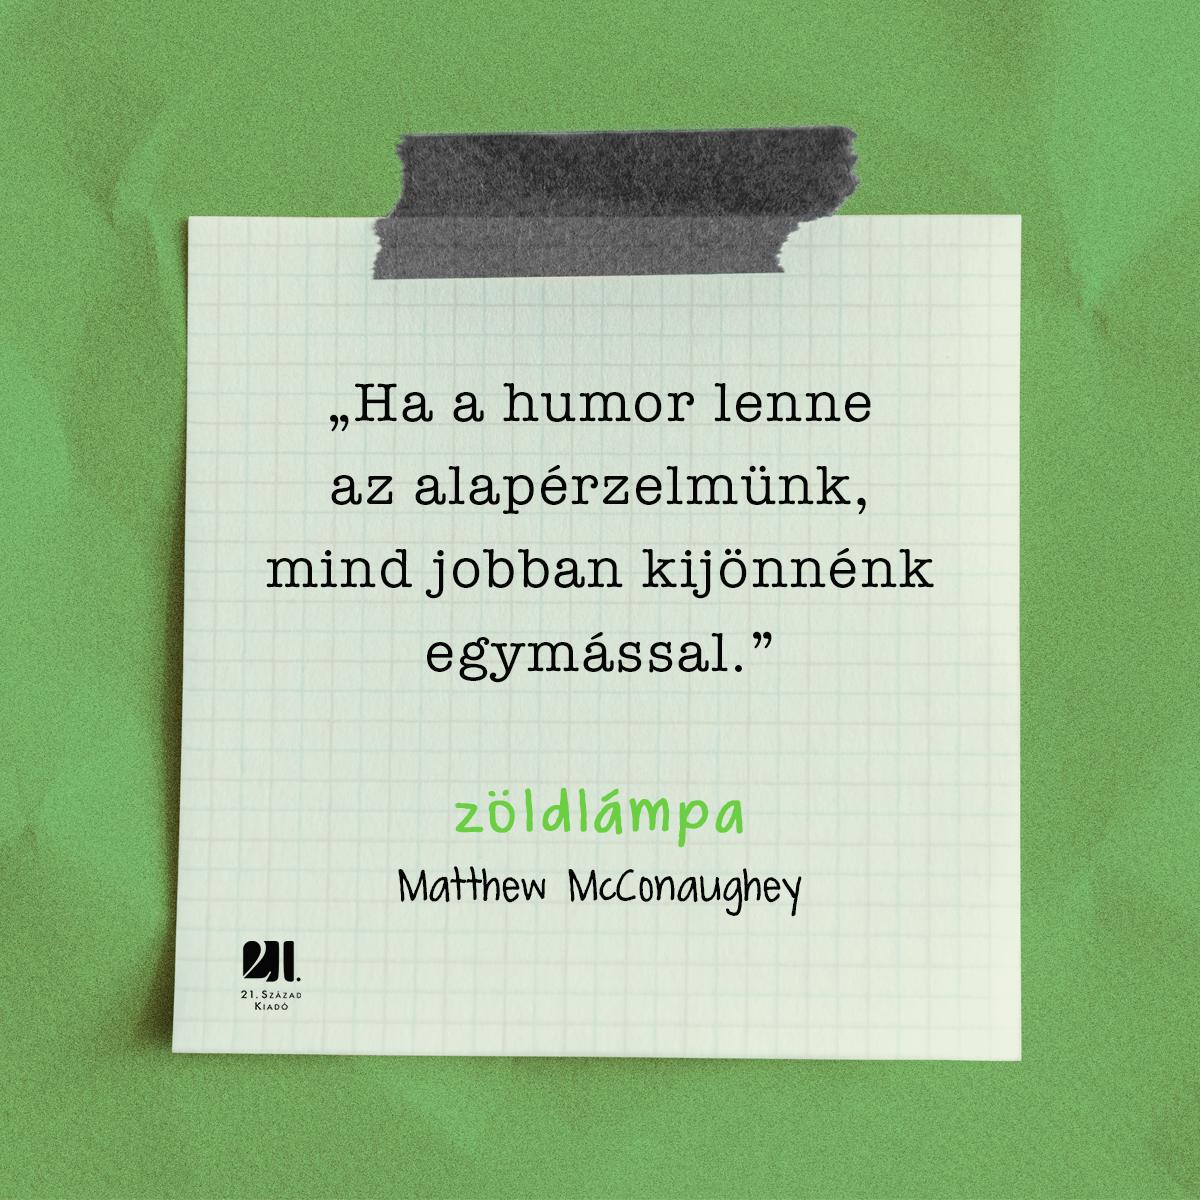 zoldlampa-matthaw-mcconaughey03.png